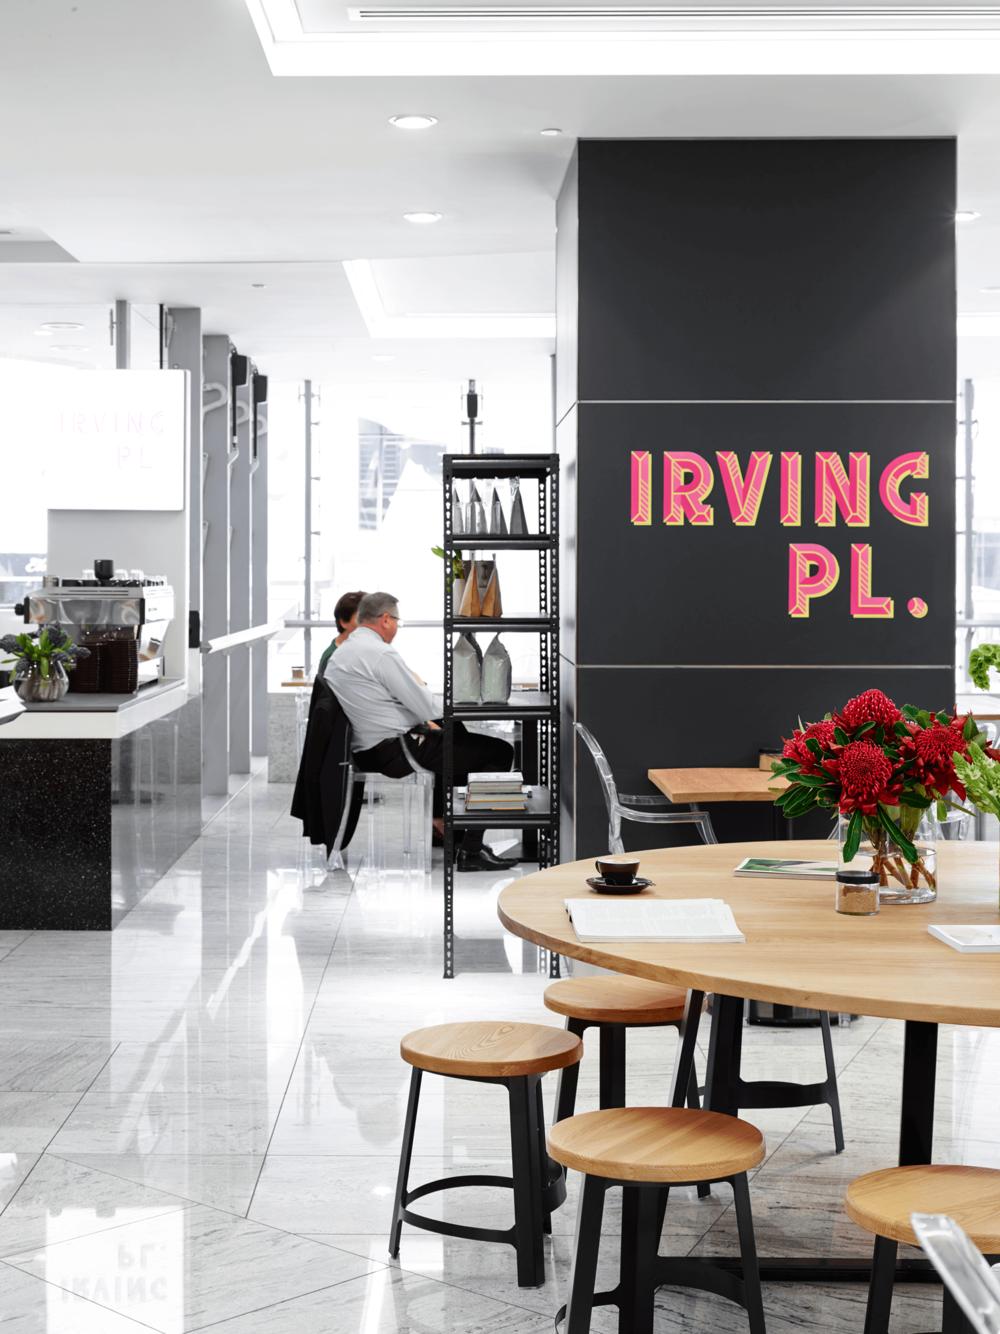 georgia-cannon-interior-designer-brisbane-project-irving-place-cafe-25564.jpg